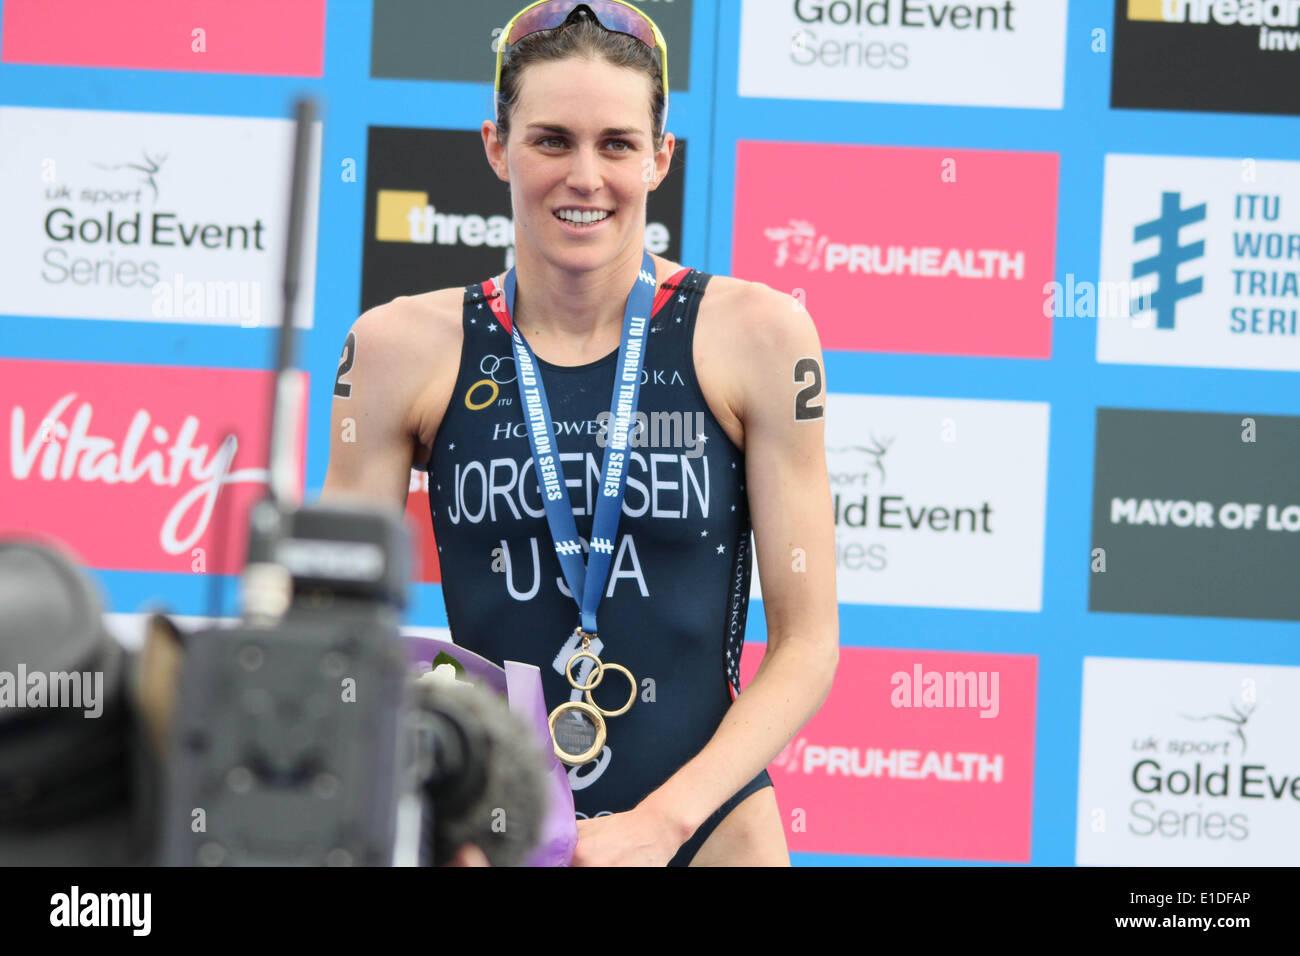 London, UK. 31st May, 2014. Gwen Jorgensen winas the  women elite ITU Triathlon Credit:  petericardo lusabia/Alamy Stock Photo